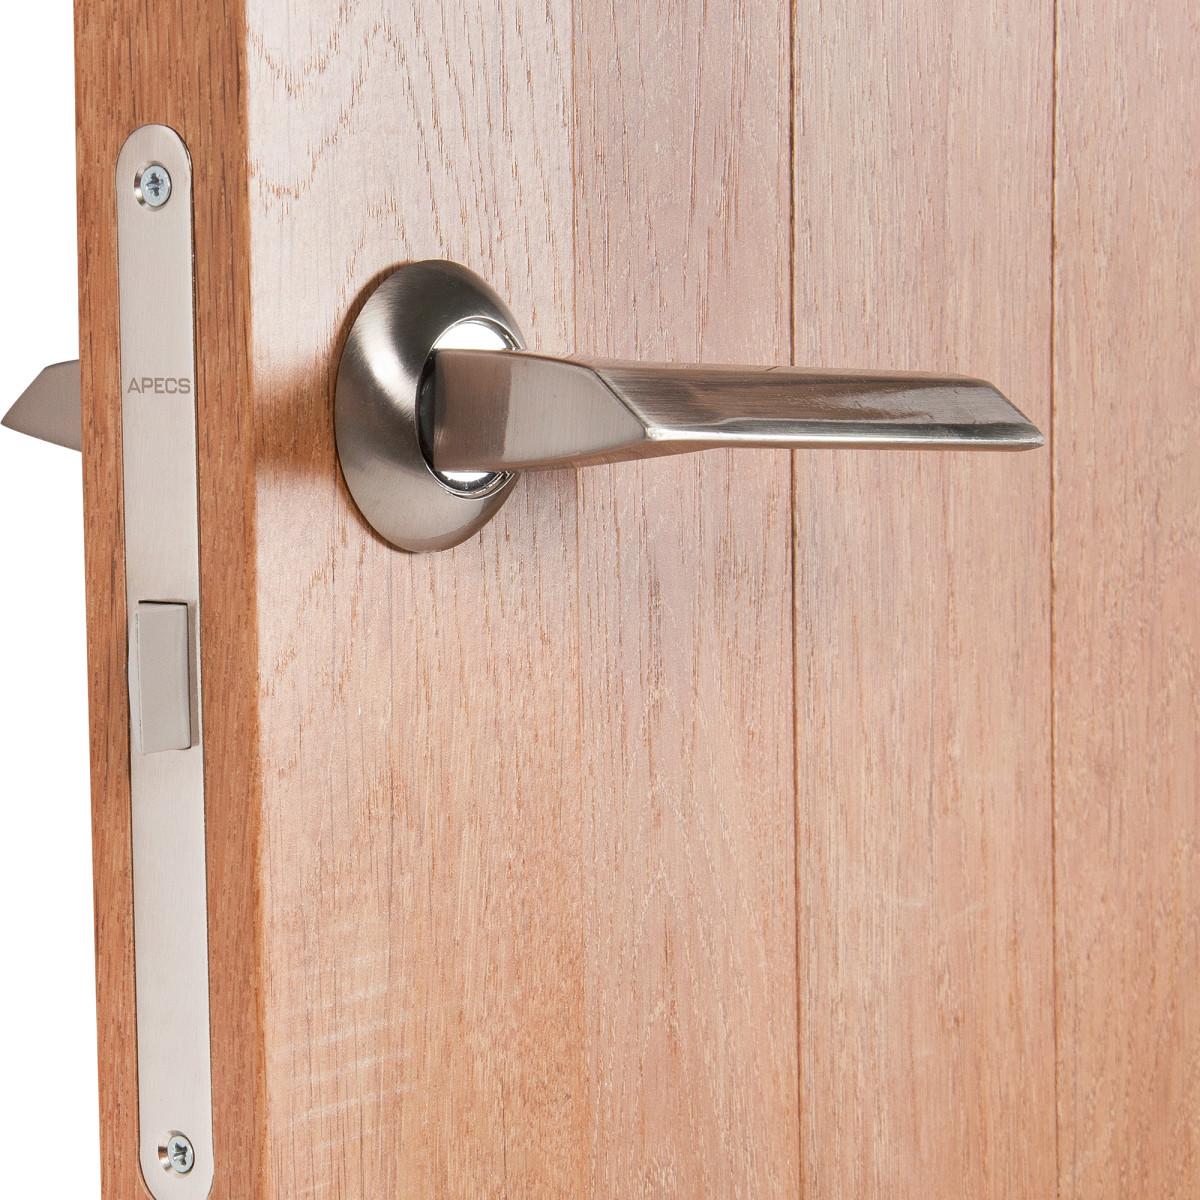 Дверь Межкомнатная Глухая Кантри 70x200 Пвх Цвет Дуб Арагон С Фурнитурой